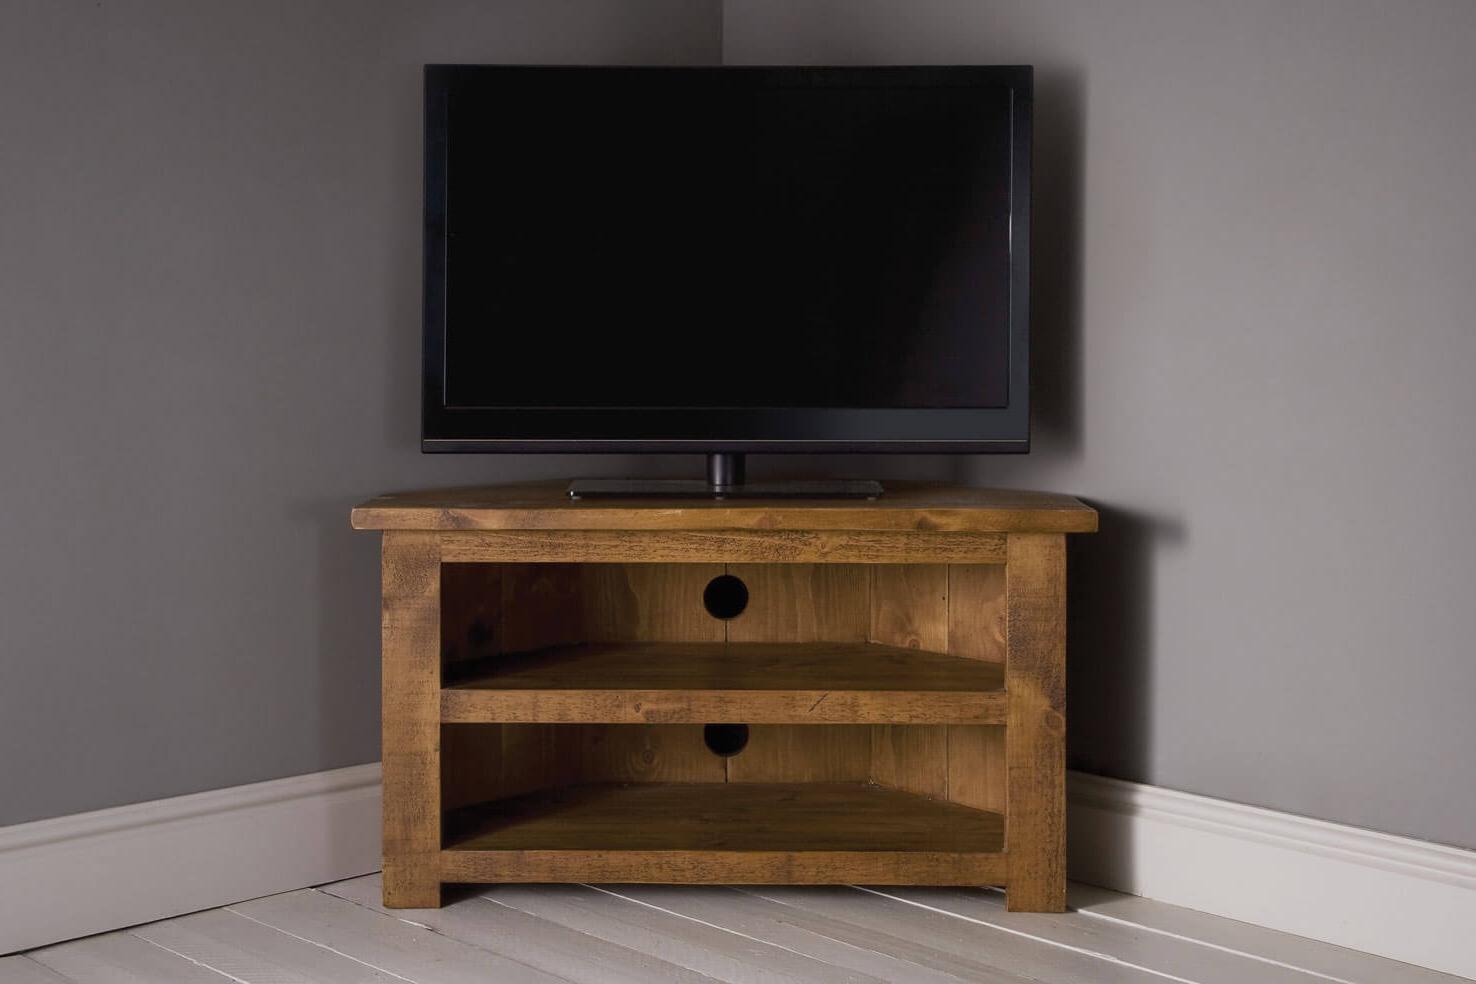 Best And Newest Corner Tv Units Regarding Plank Corner Tv Unit With Shelfindigo Furniture (View 2 of 20)